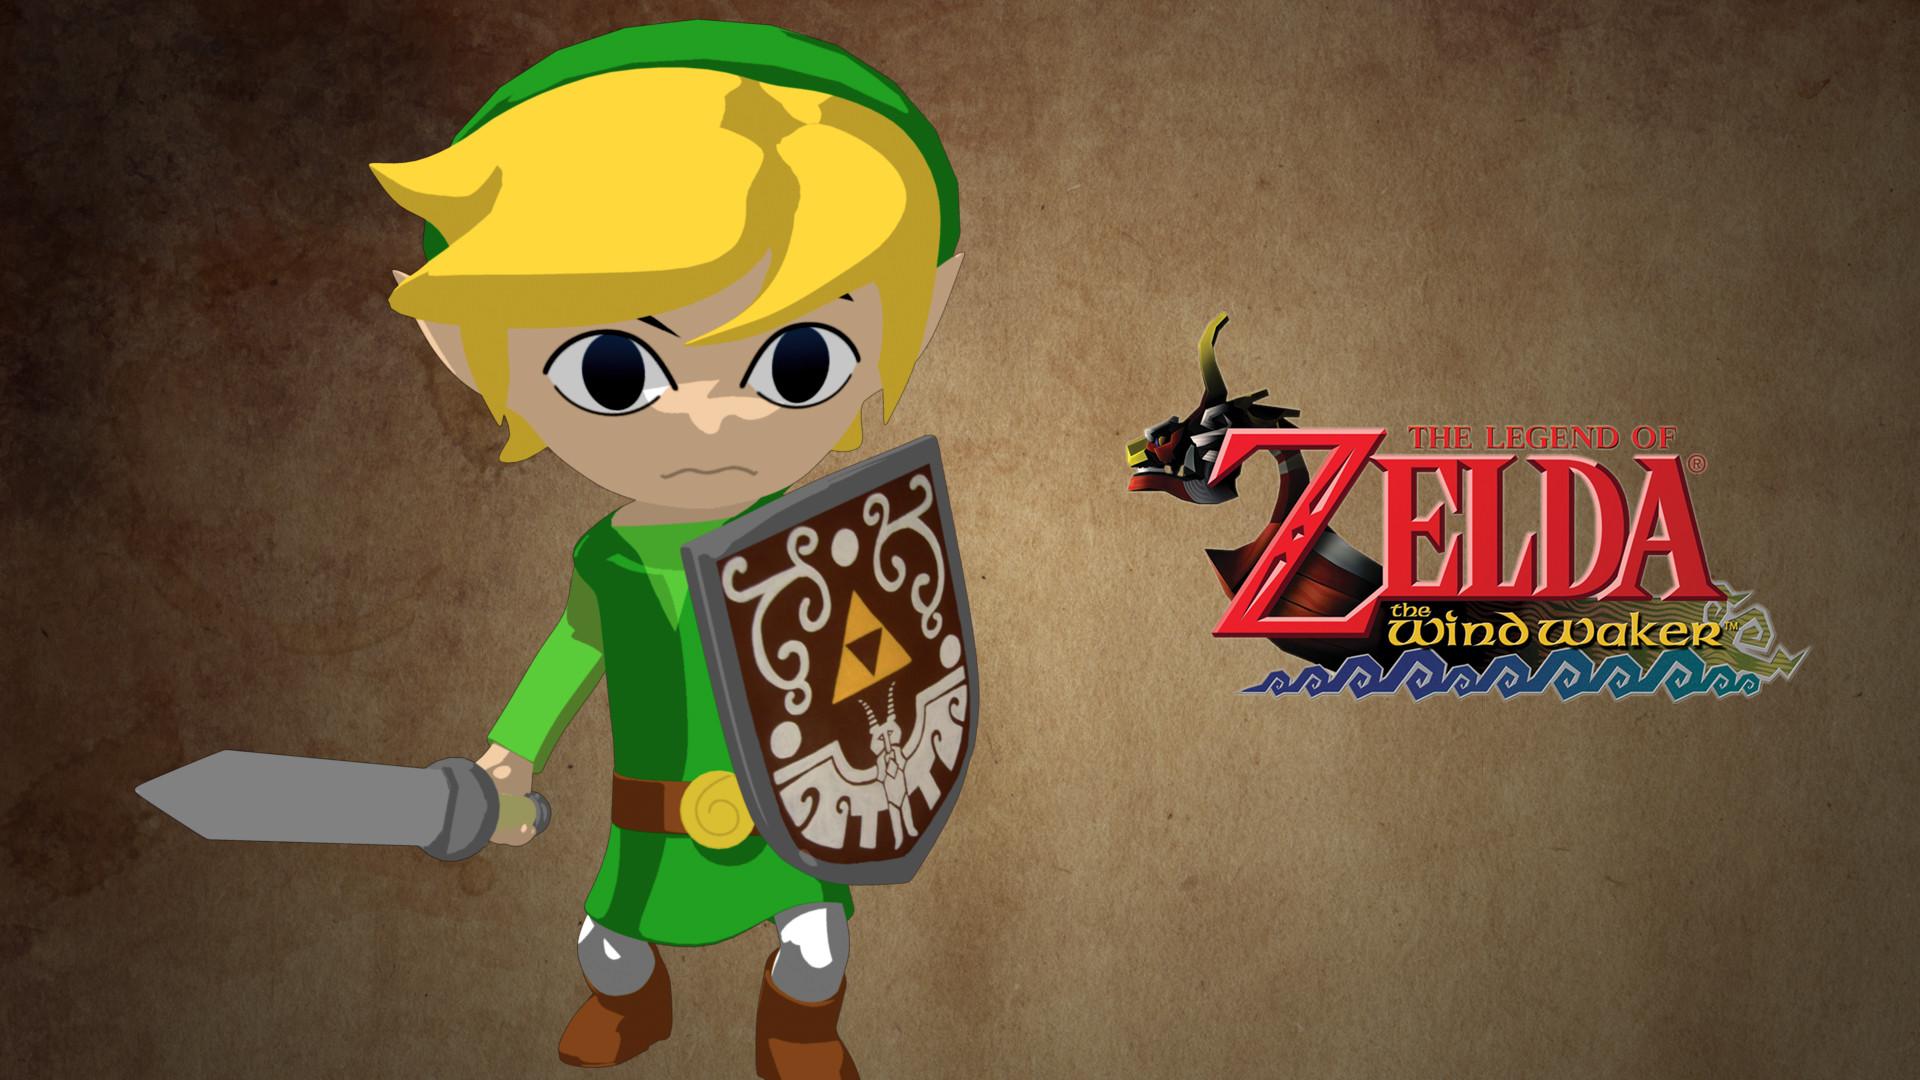 … The Legend of Zelda Wind Waker – Wallpaper by Elrohironip